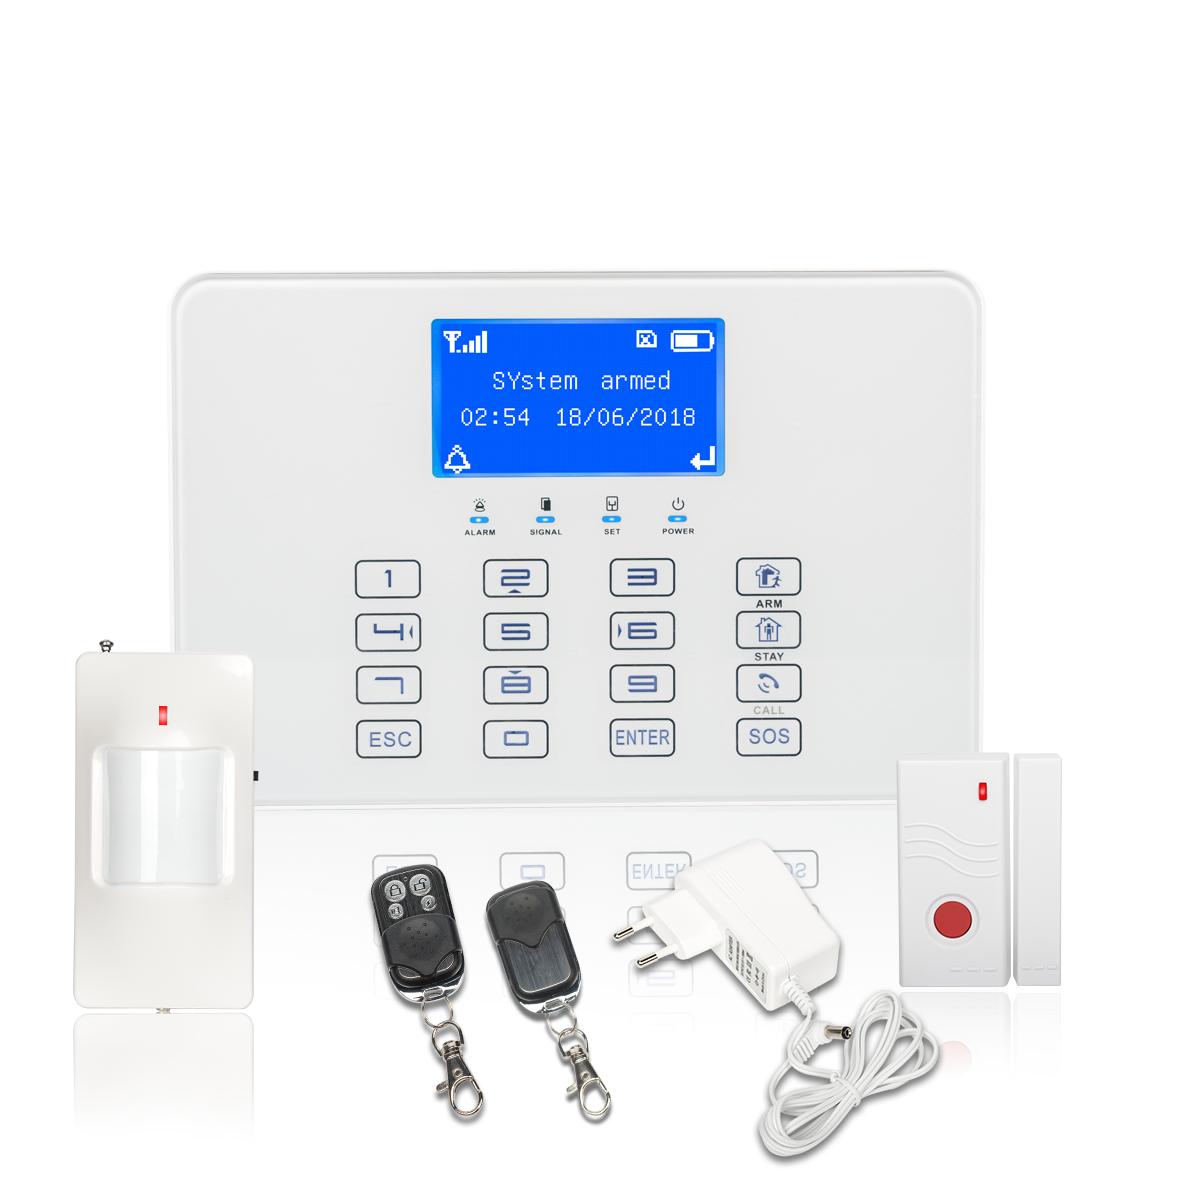 s1 best smart wireless home security gsm alarm system with mobiles1 best smart wireless home security gsm alarm system with mobile call, intelligent burglar alarm system